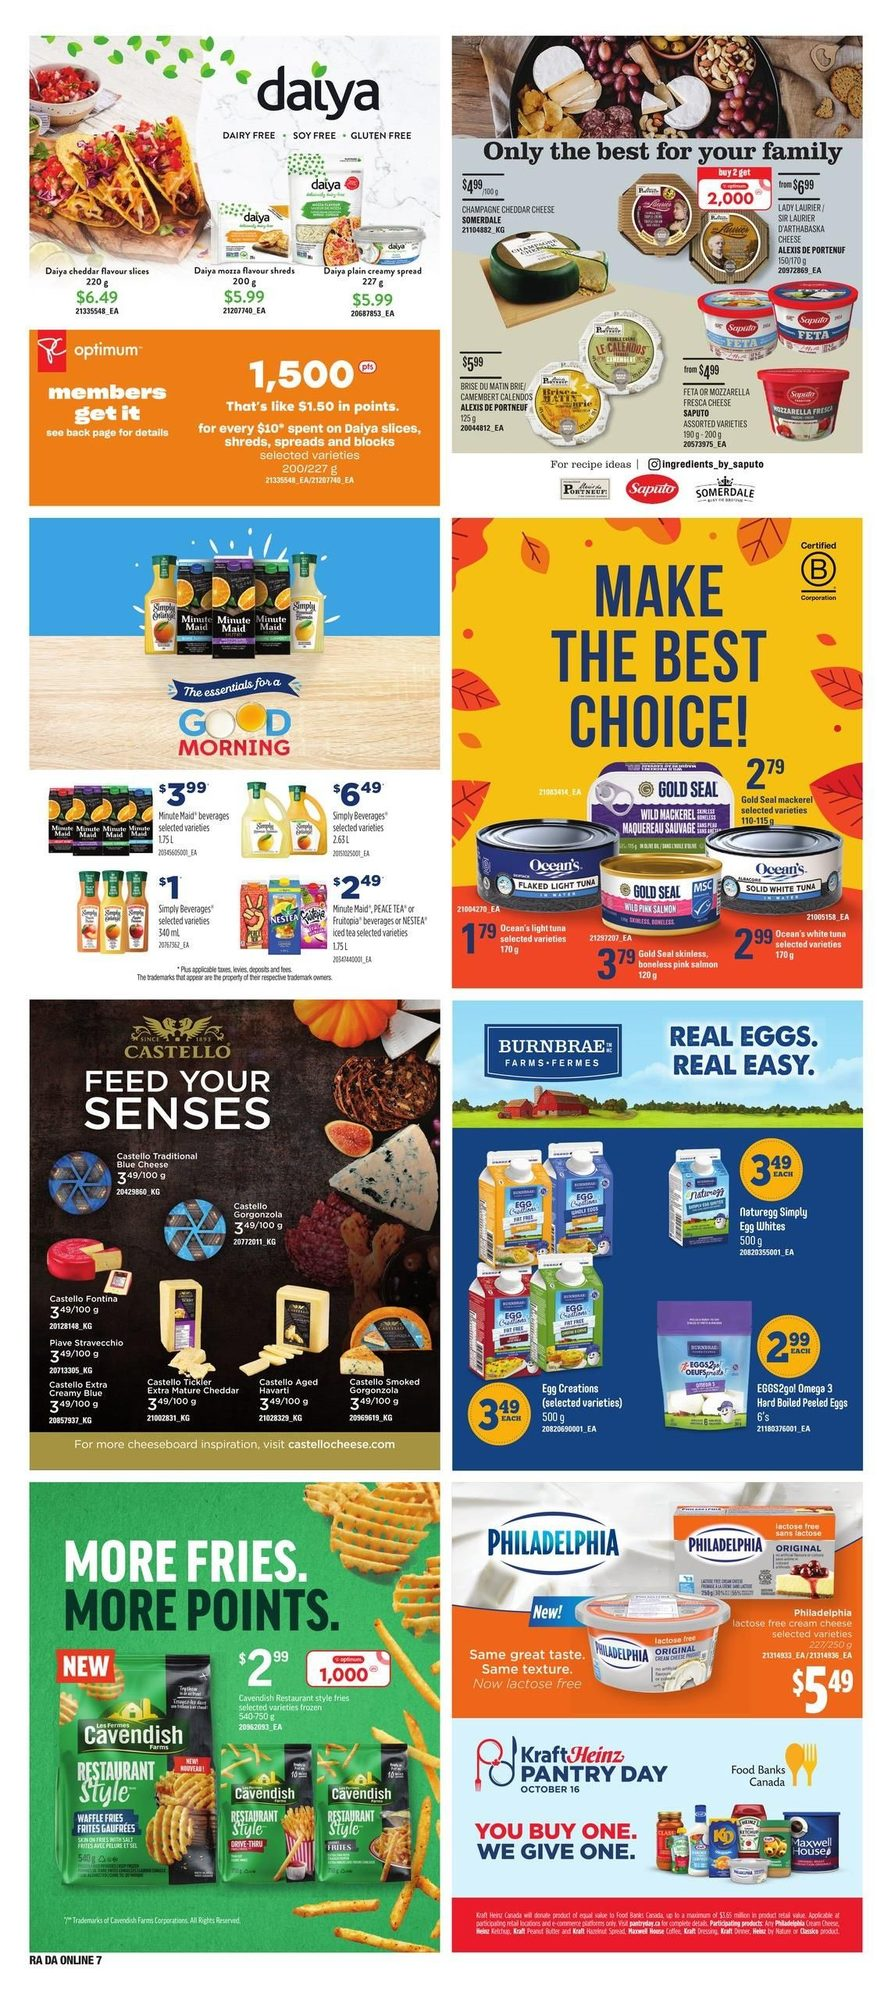 Atlantic Superstore - Weekly Flyer Specials - Page 13